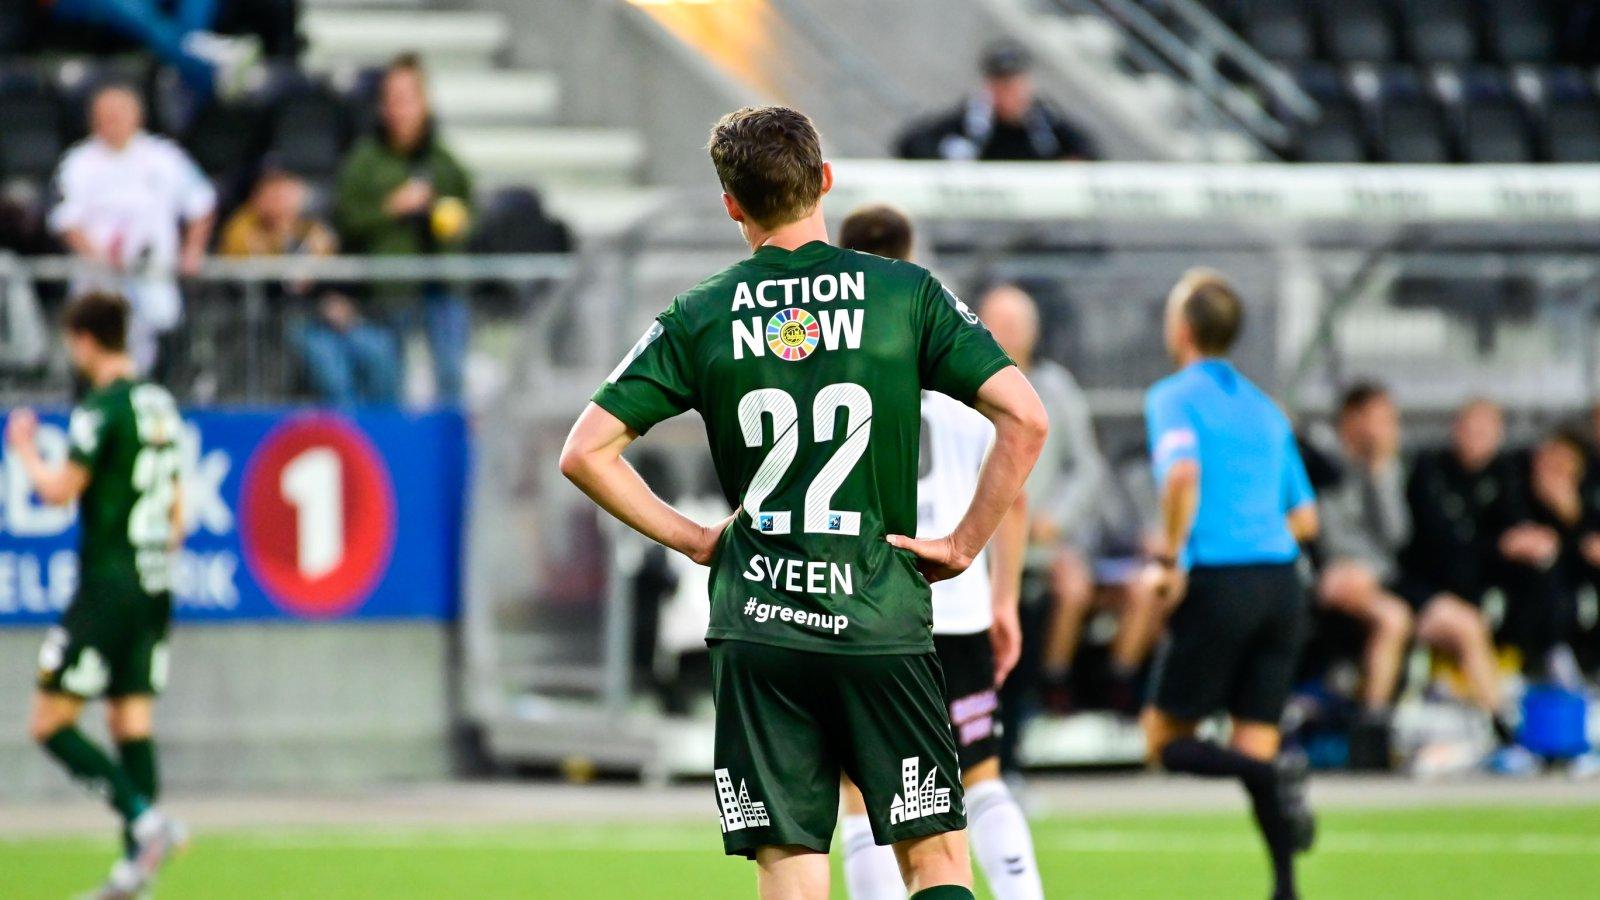 Ole Amund Sveen under bortekampen mot Odd i 2019. Action Now.